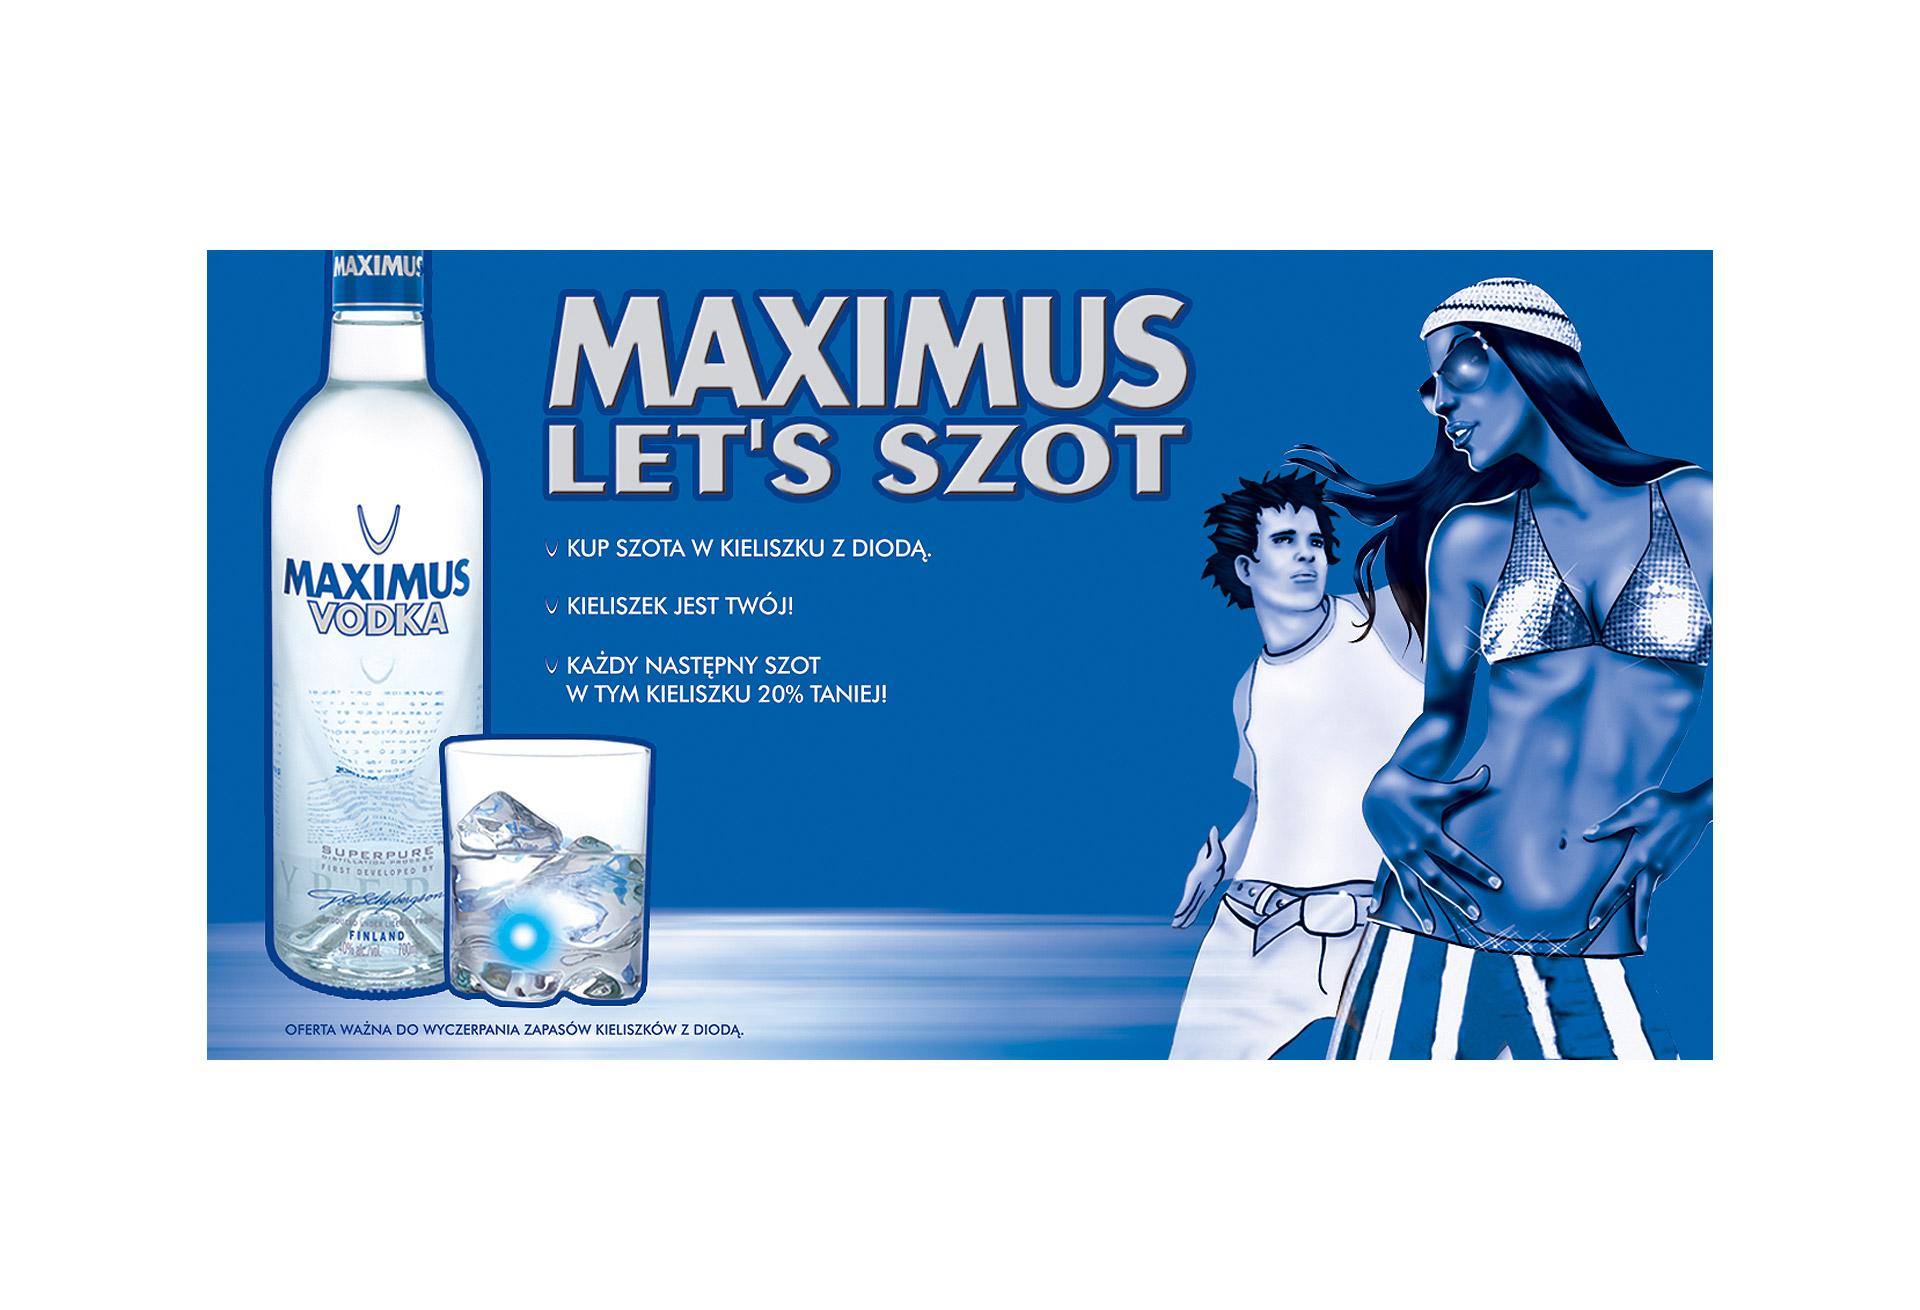 maximus-vodka-plakat